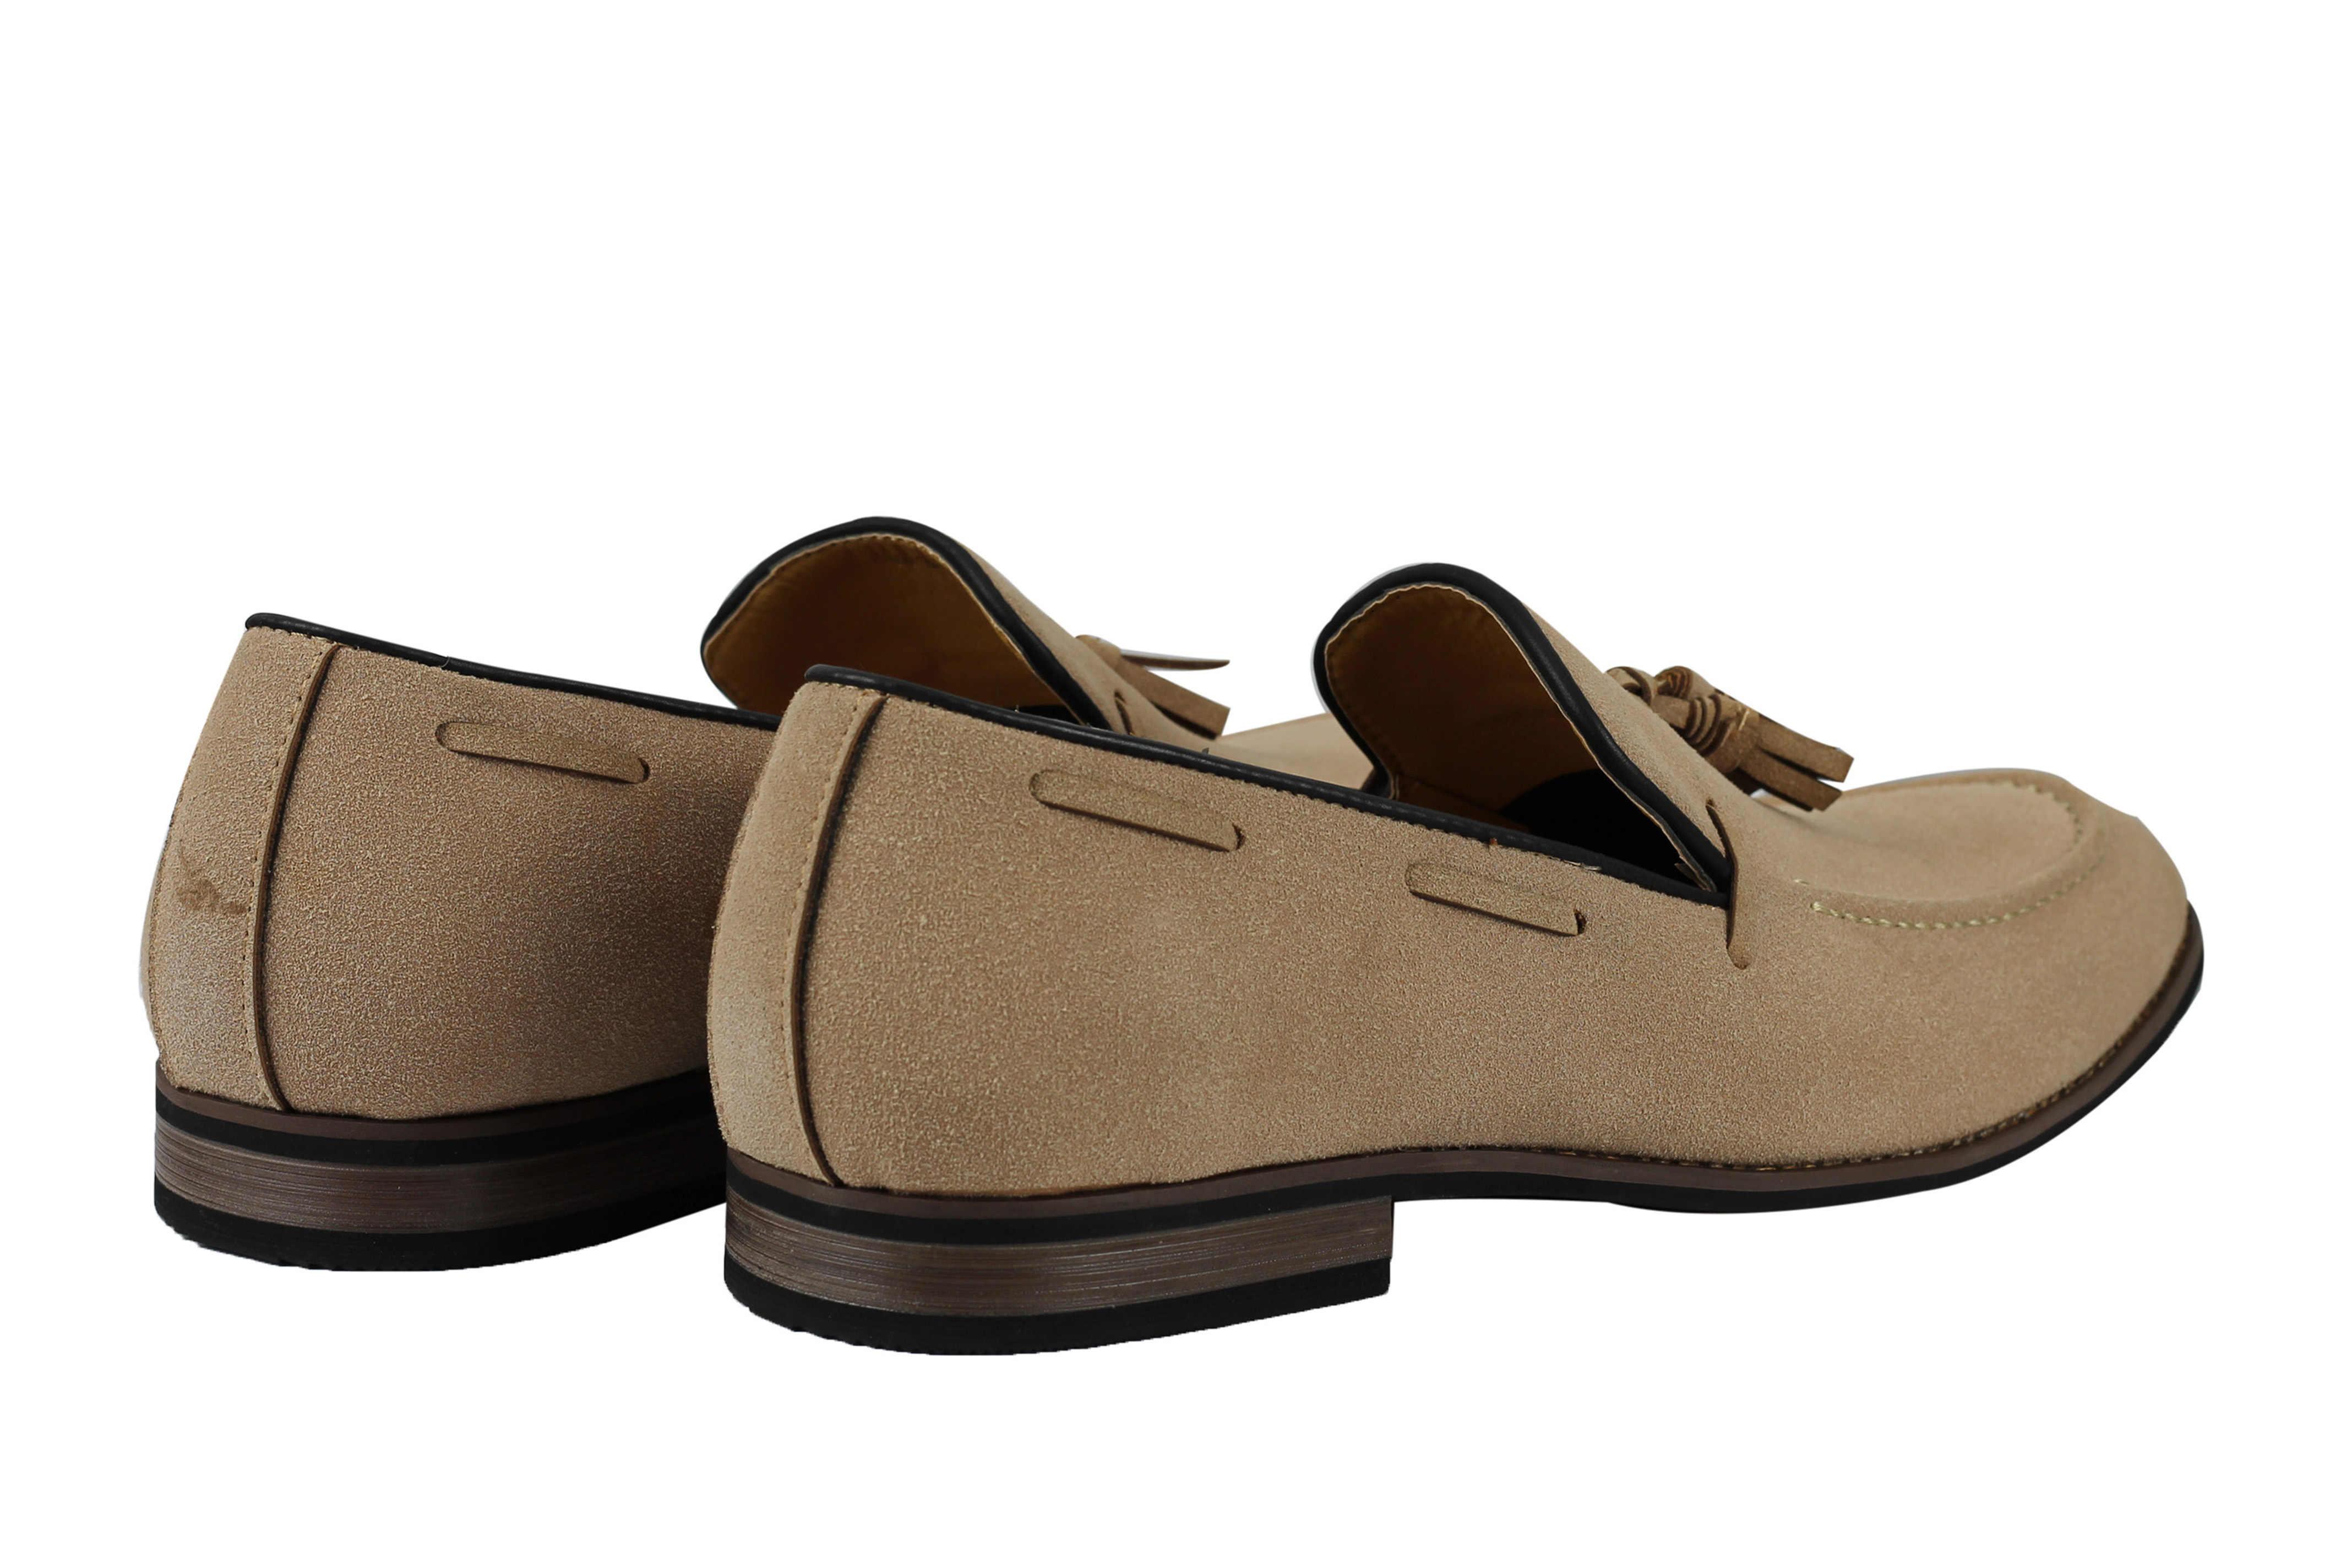 786a7343358 Mens Suede Leather Line Tassel Loafers Vintage Smart Retro Slip on ...